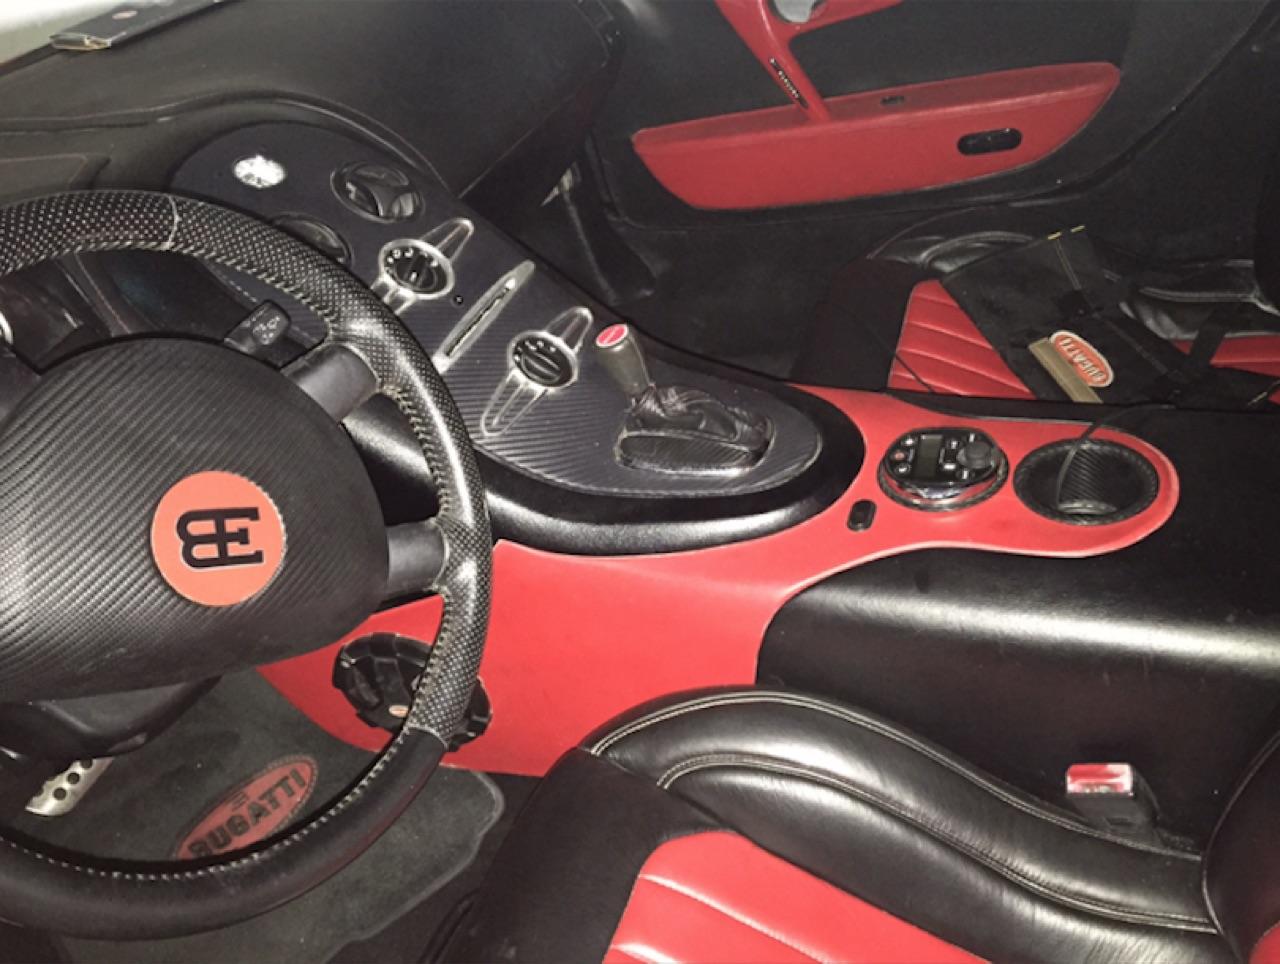 Ford-Cougar-Bugatti-Veyron-replica-01.jpg